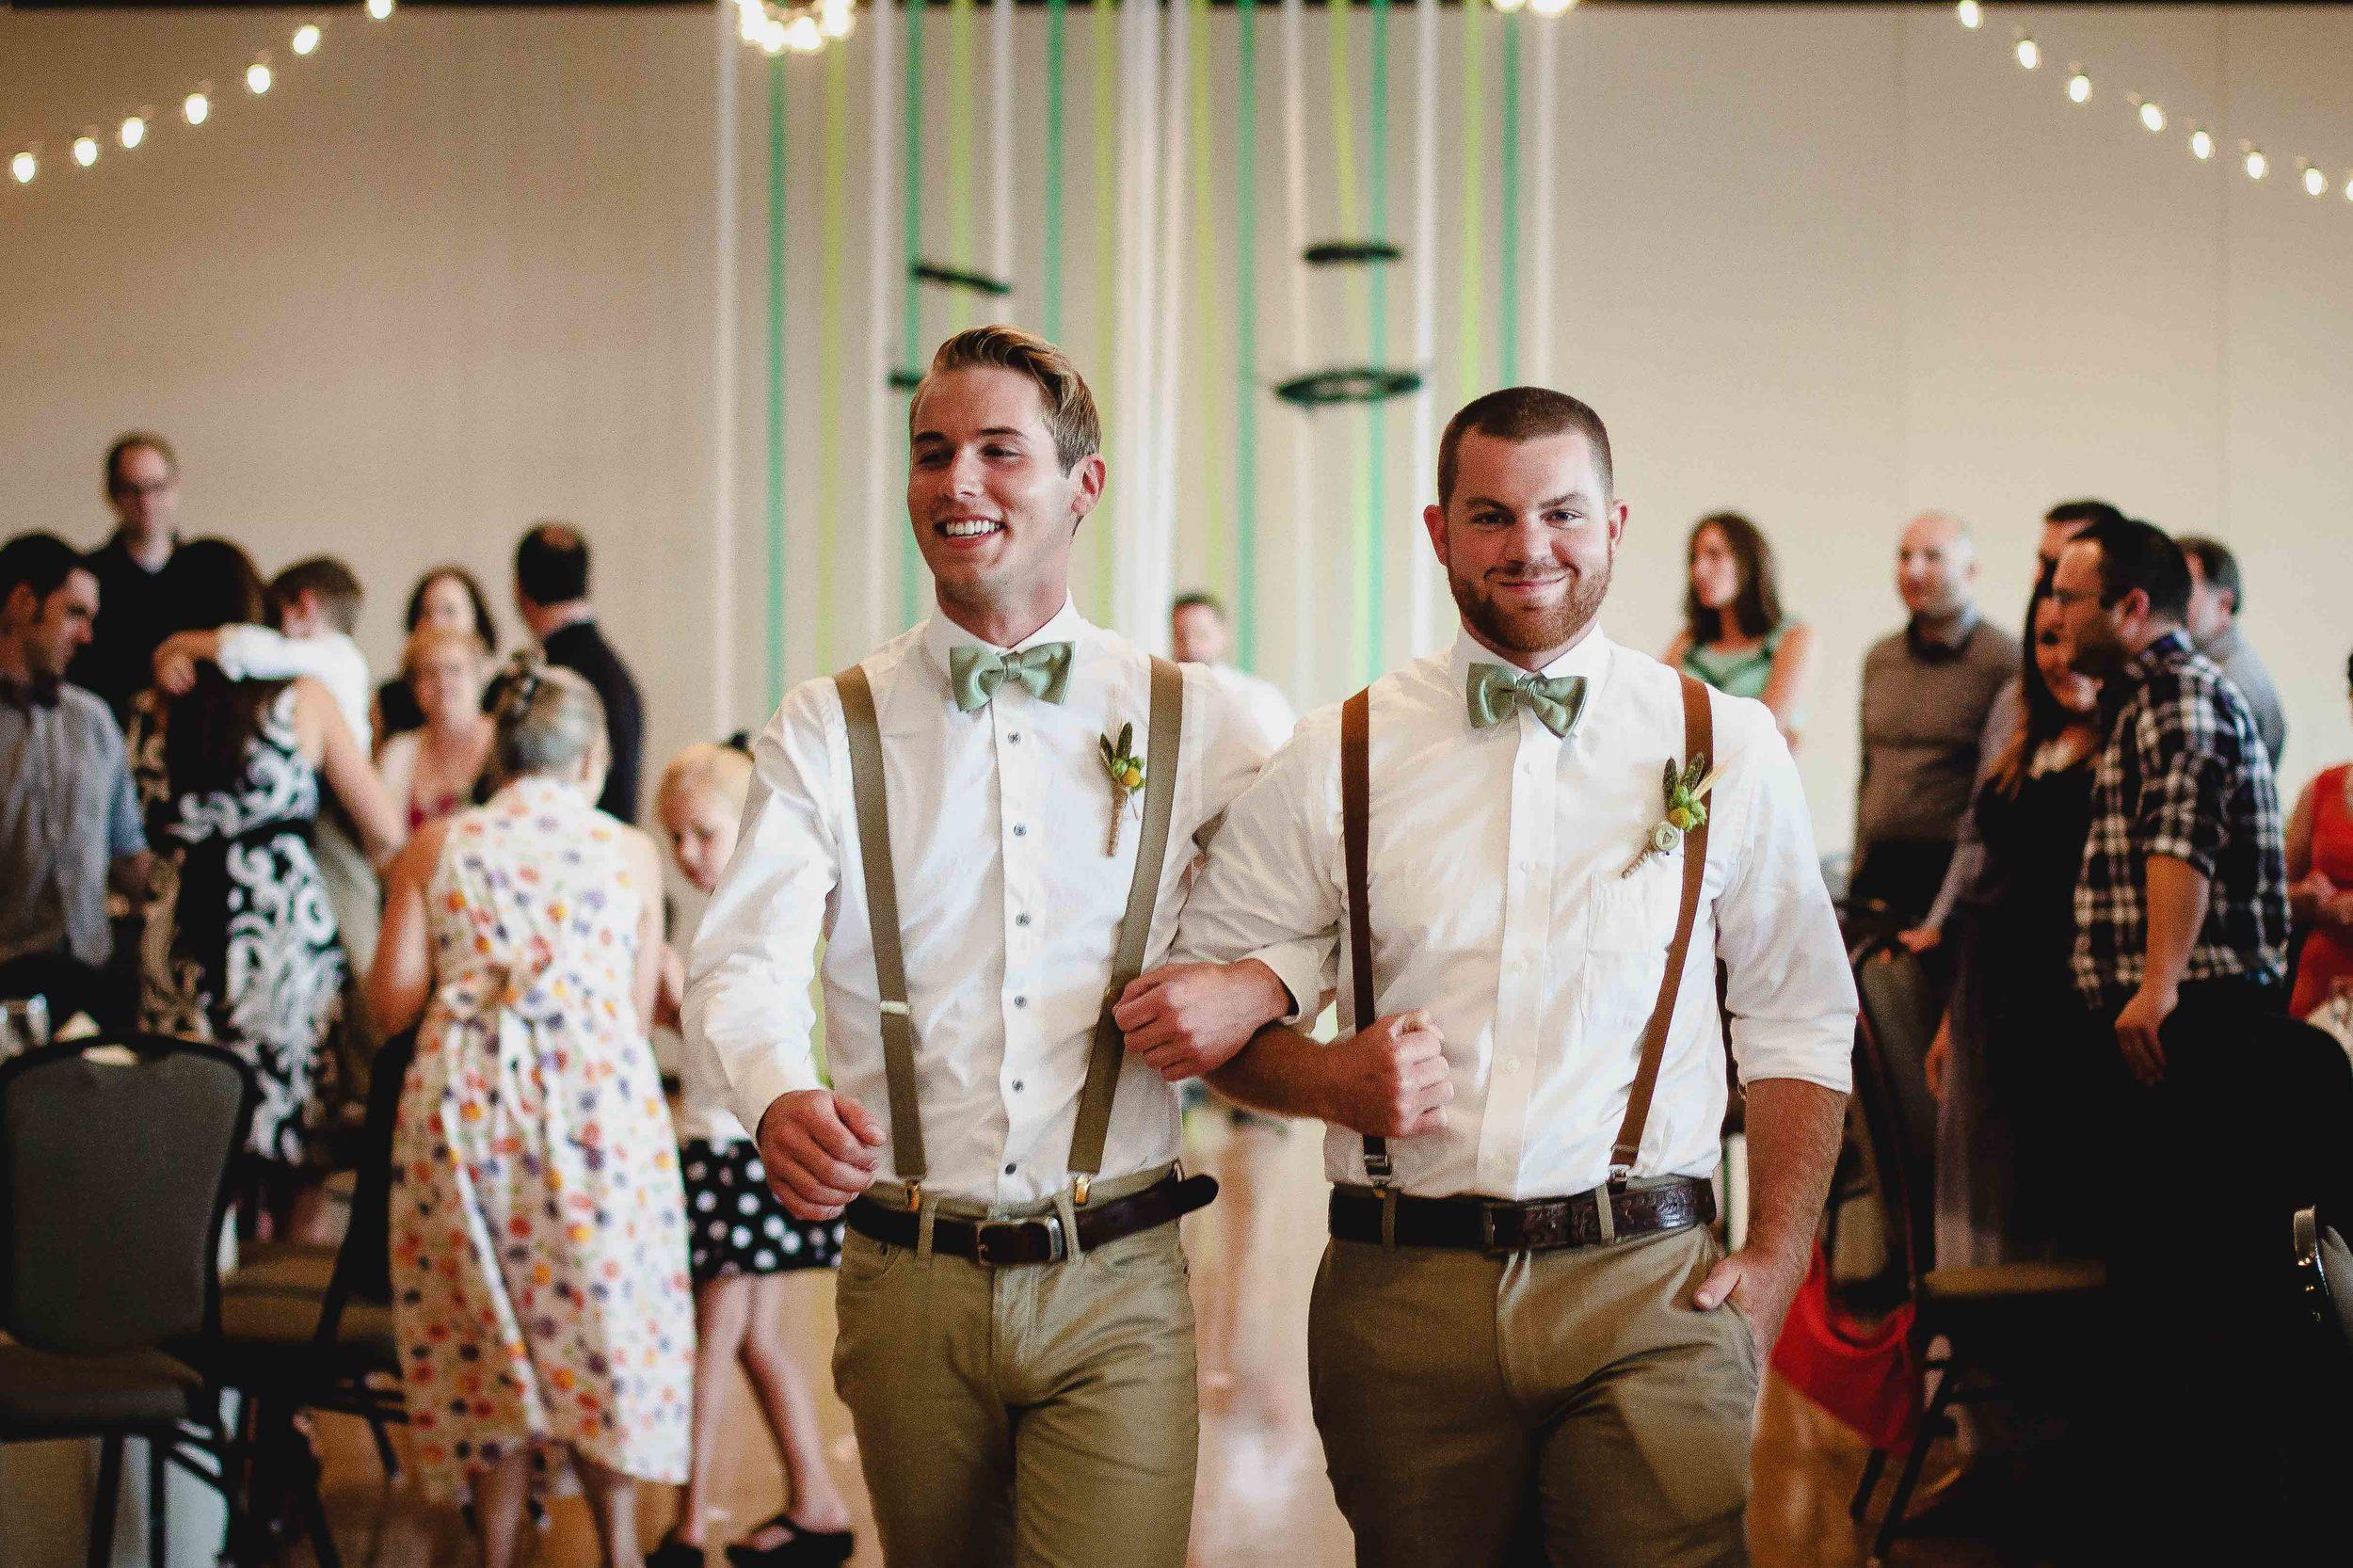 abcde wedding (101).jpg